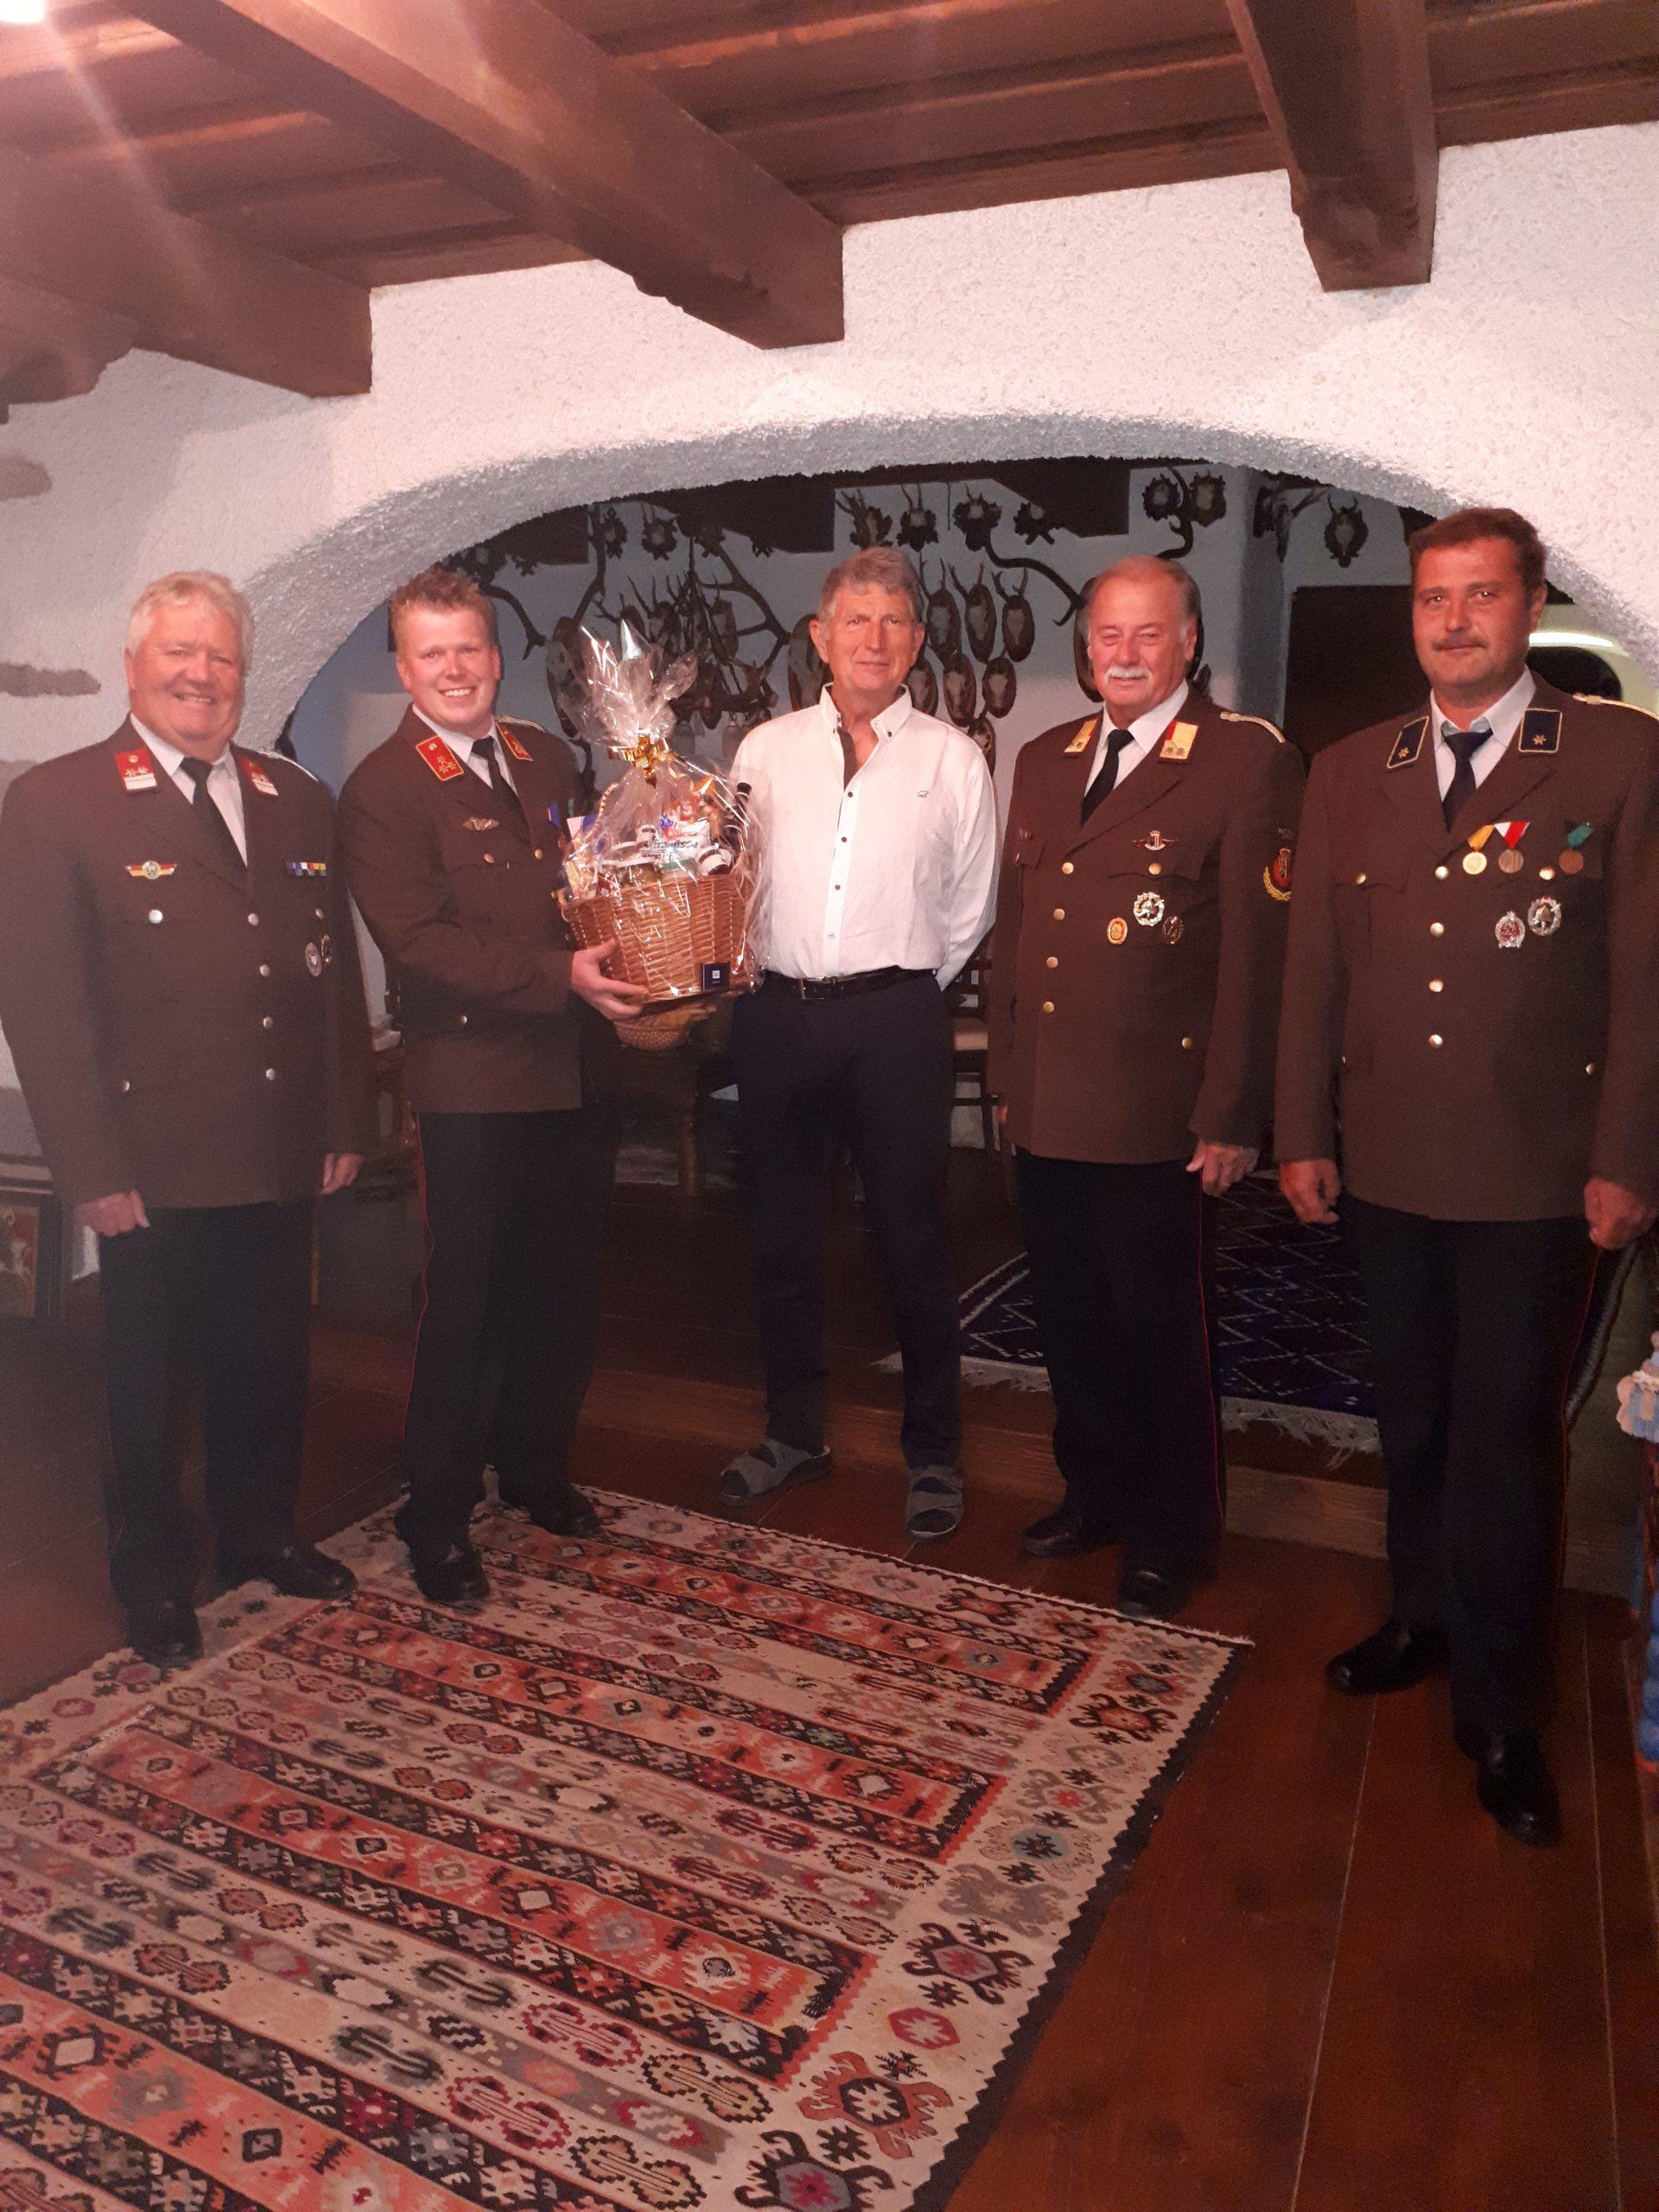 Feuerwehrarzt Dr. Mag. Wolfgang Friedl feiert seinen 70. Geburtstag